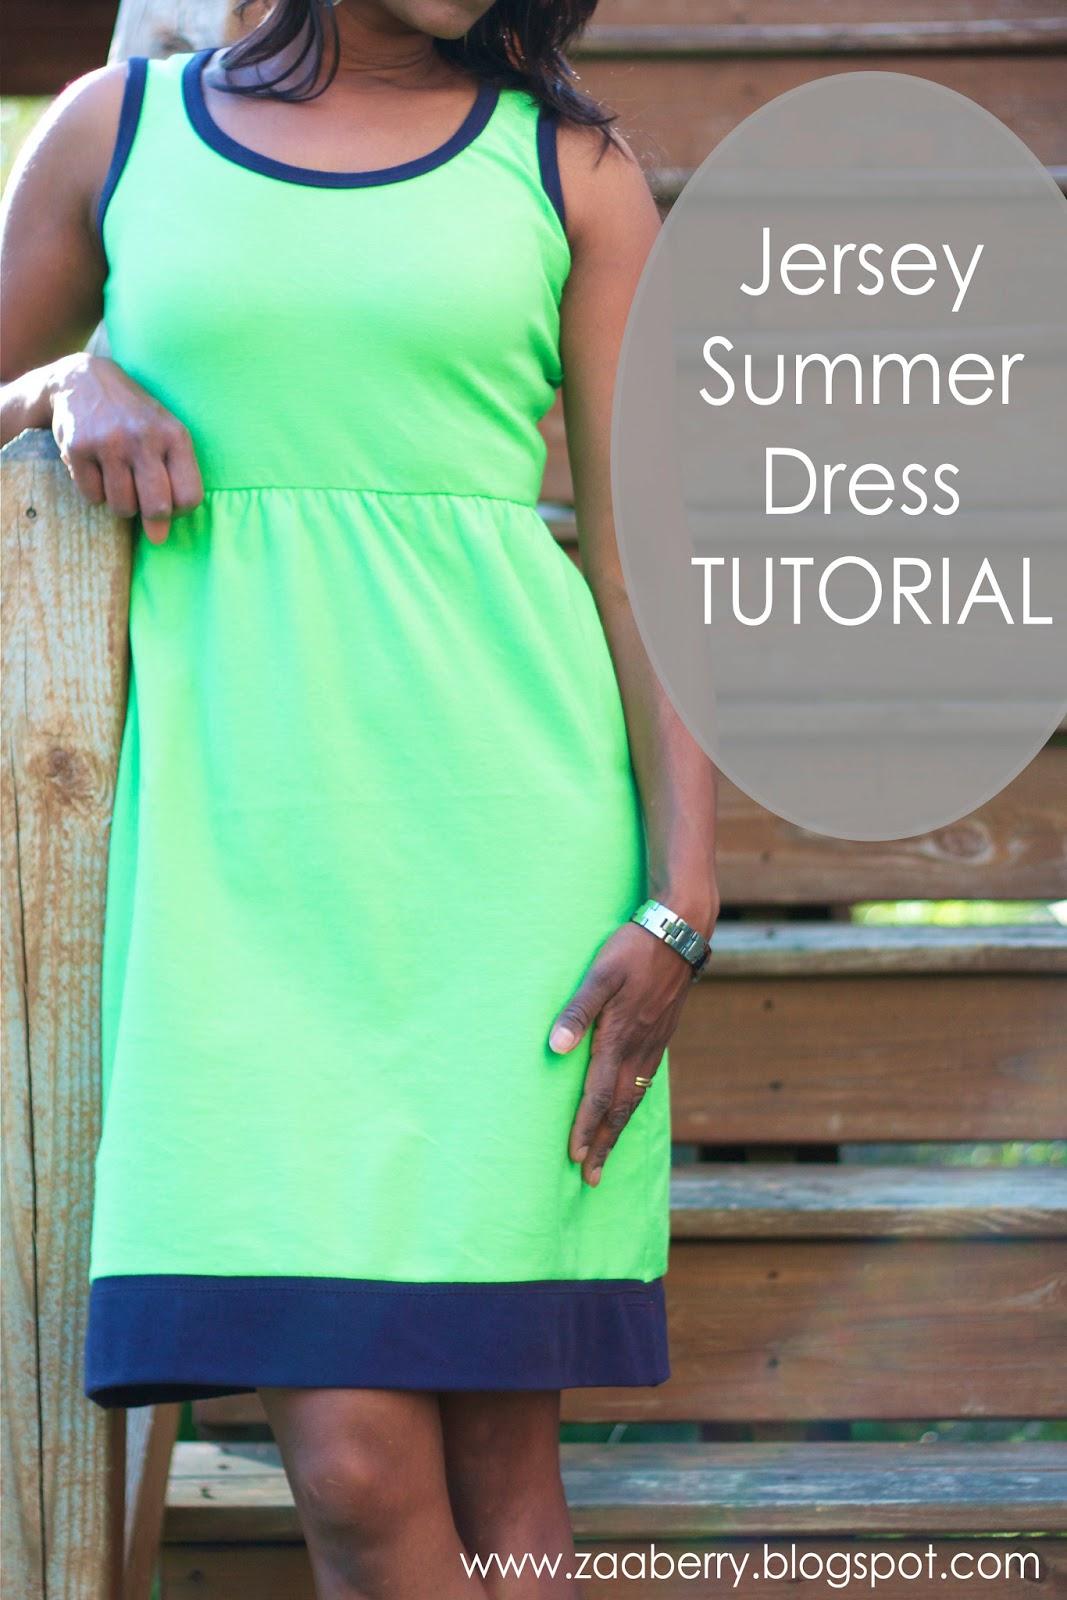 Easy Knit Dress Pattern : Zaaberry: Jersey Summer Dress TUTORIAL